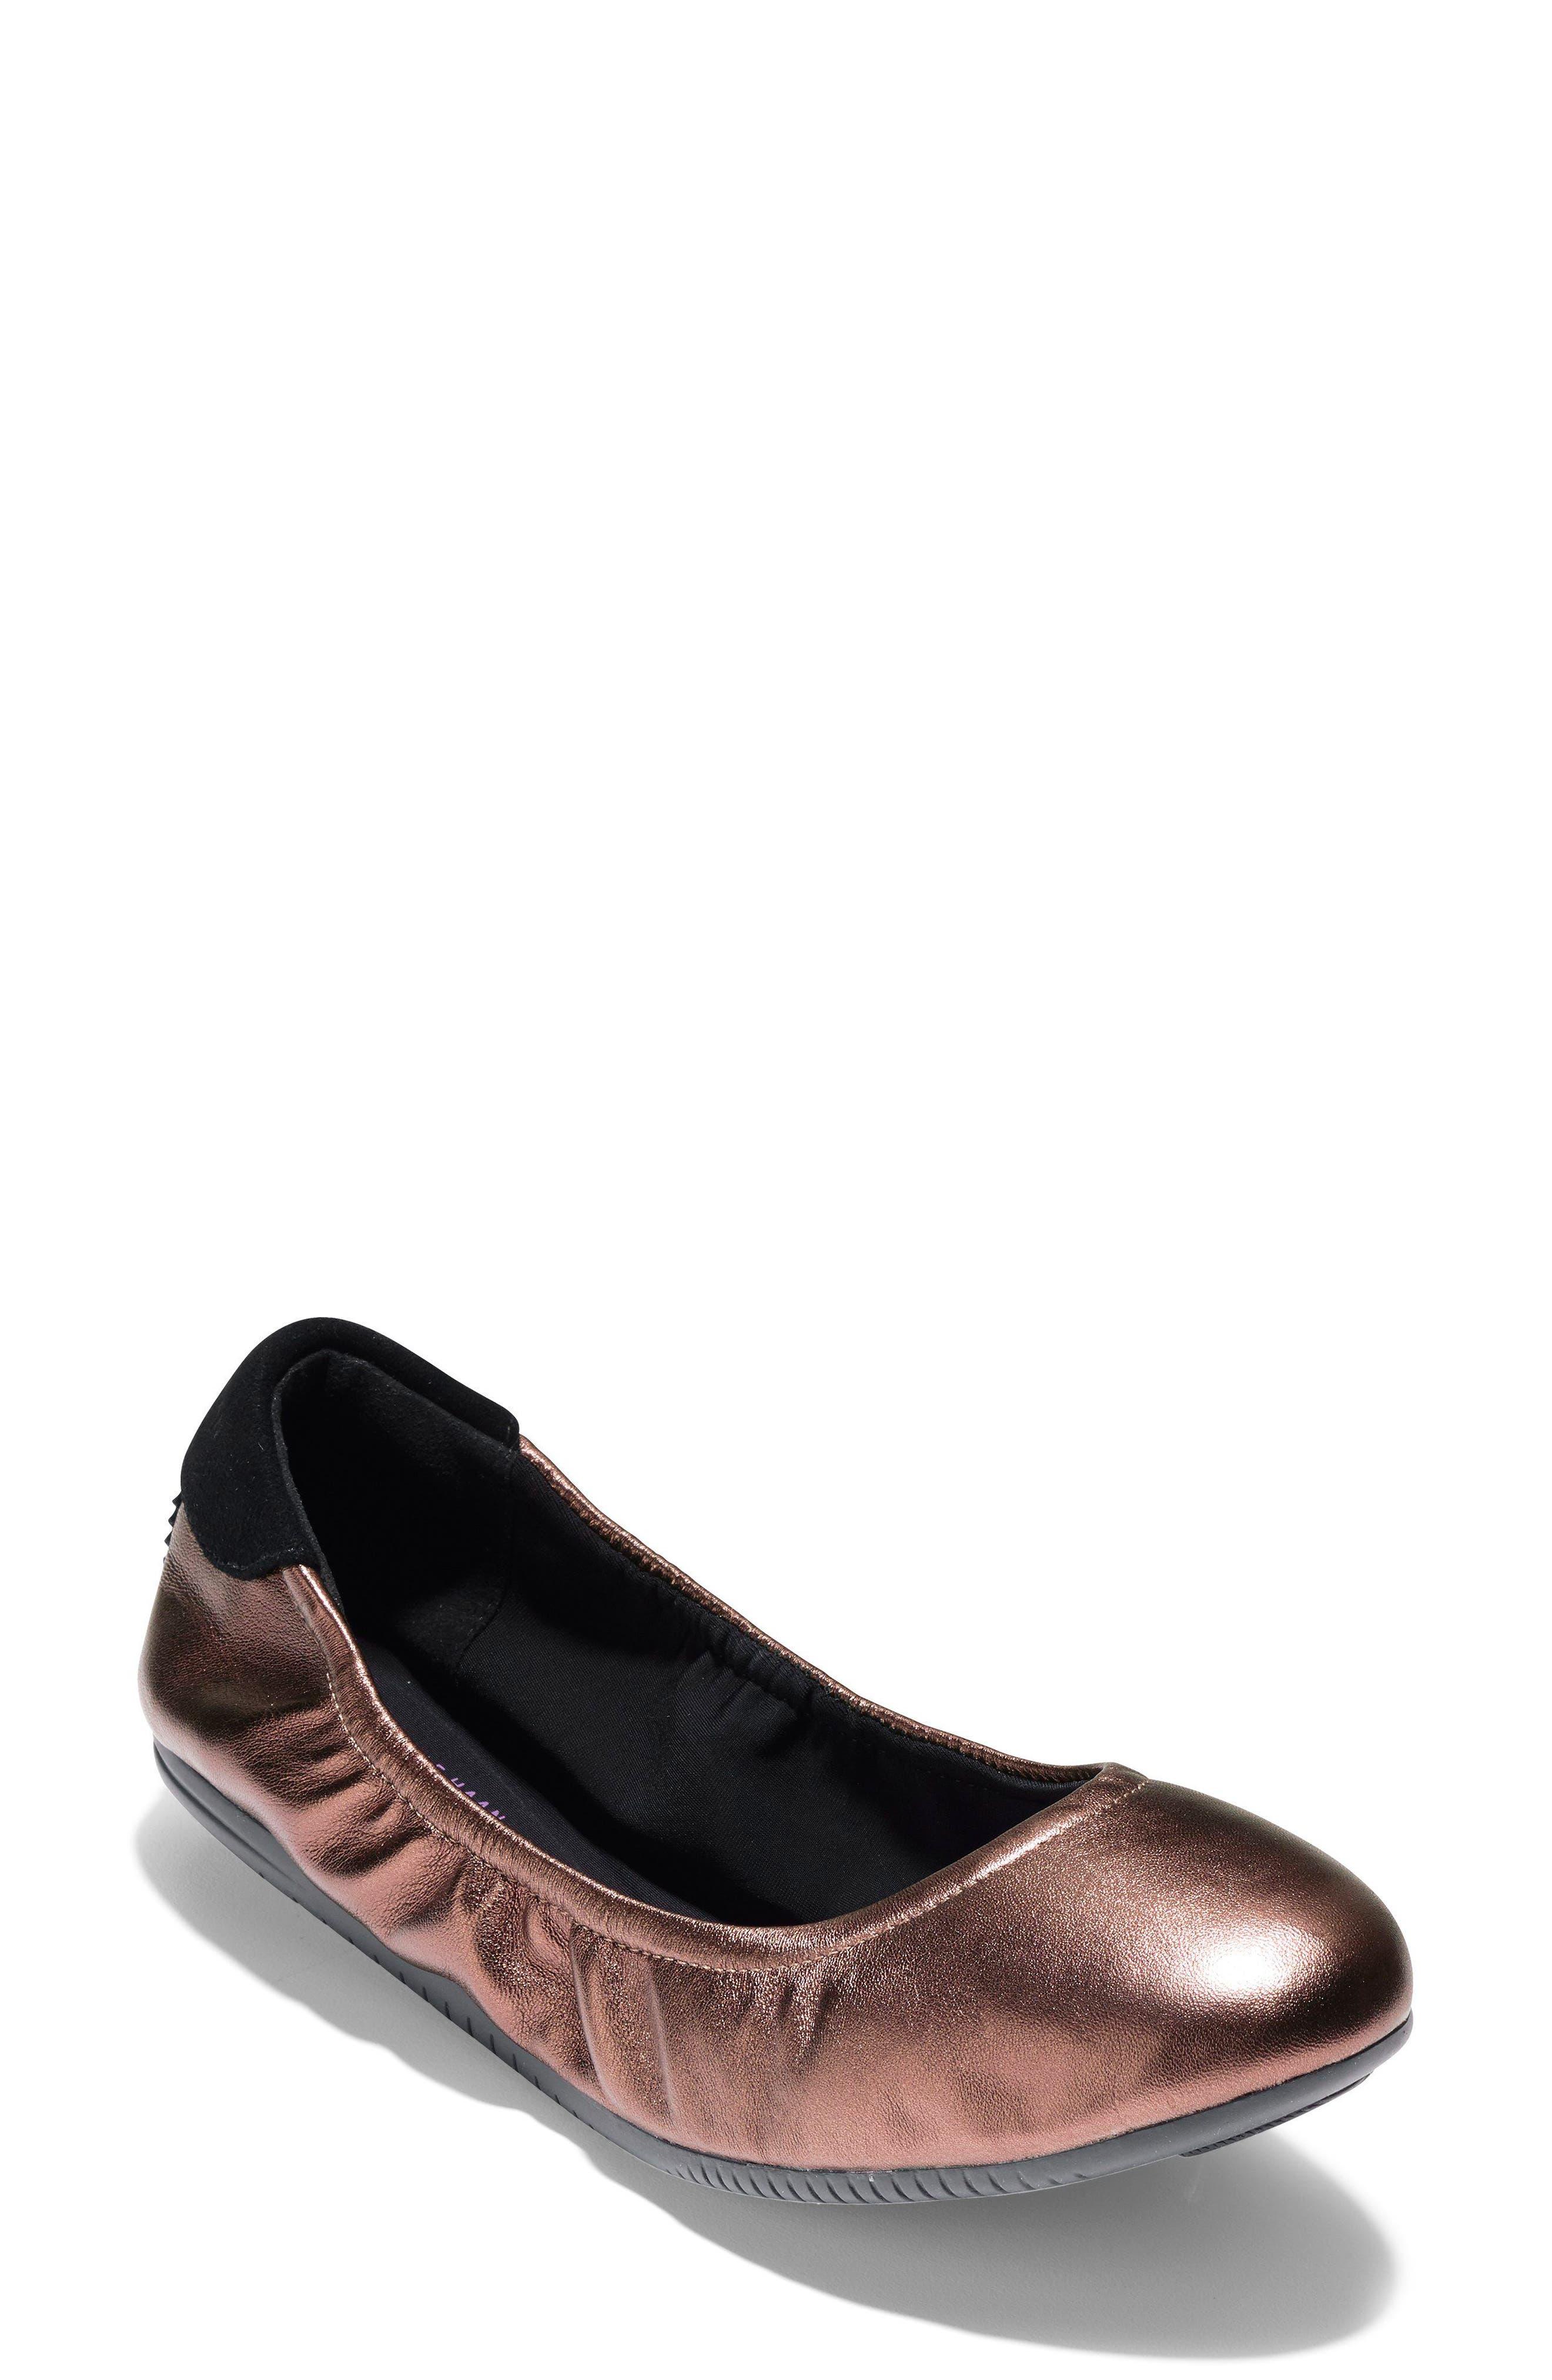 Main Image - Cole Haan Studiogrand Ballet Flat (Women)